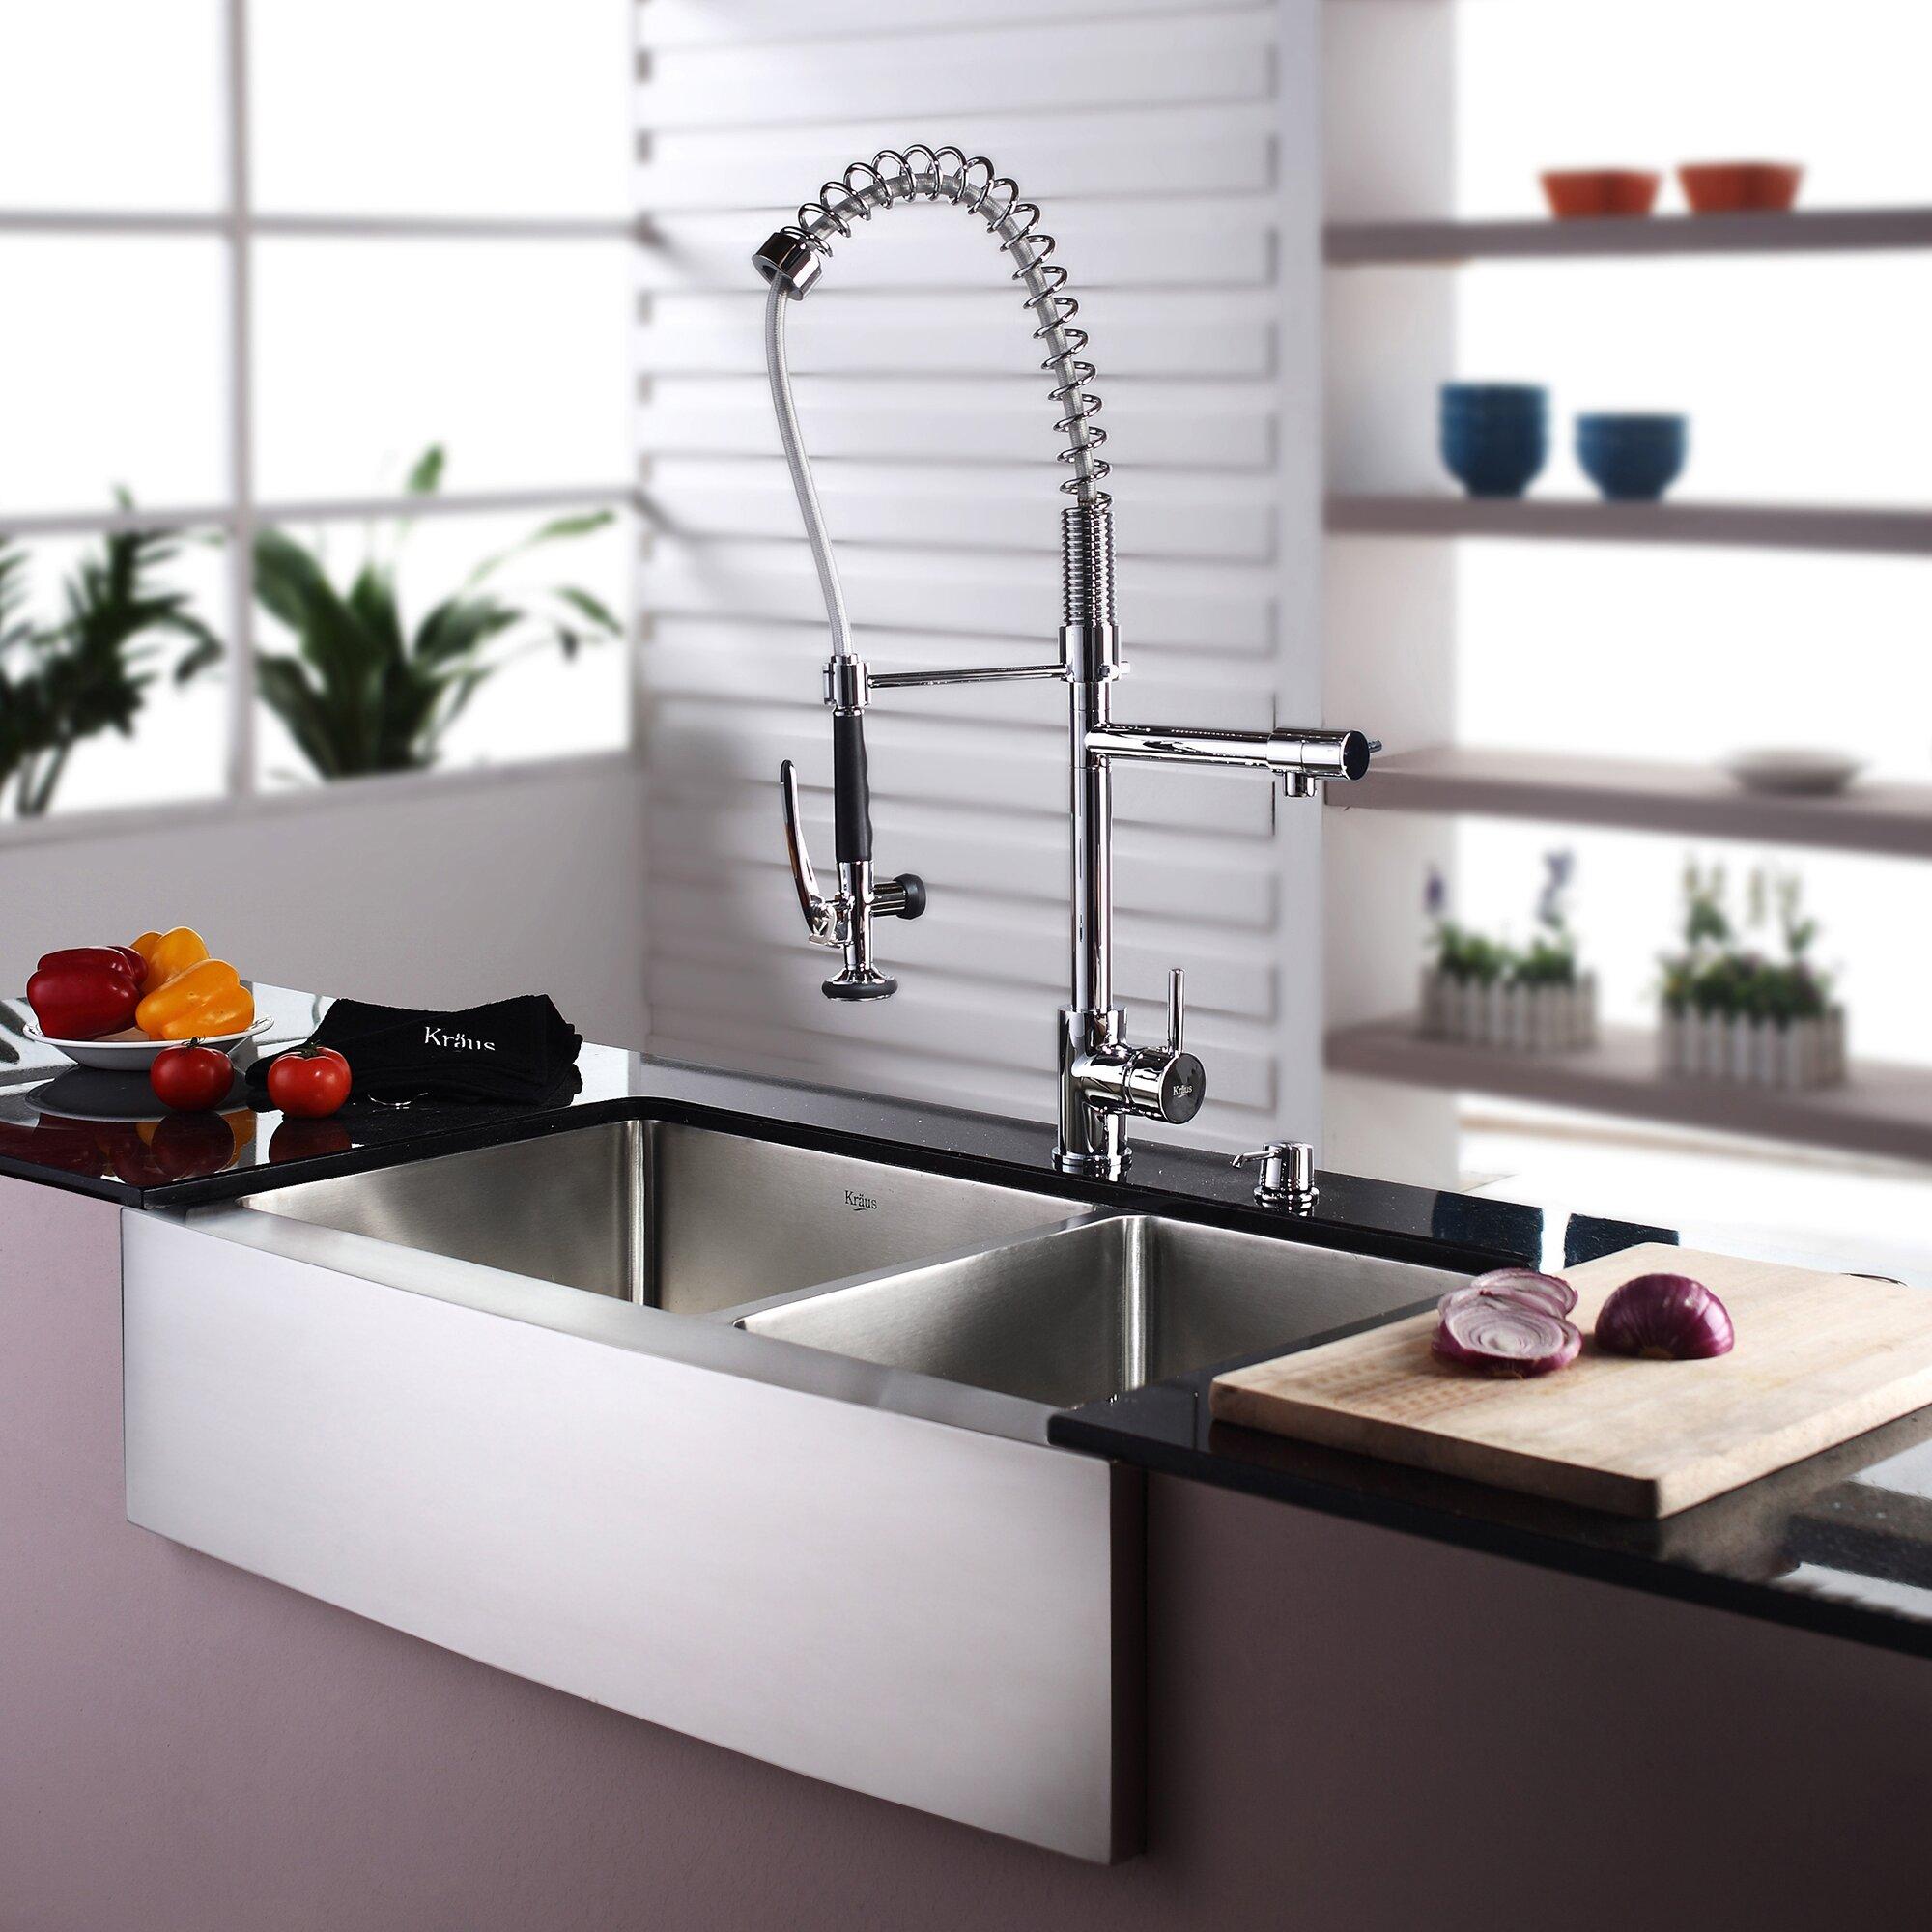 Kraus 35 9 x 8 piece farmhouse double bowl kitchen - Kitchen sink pieces ...